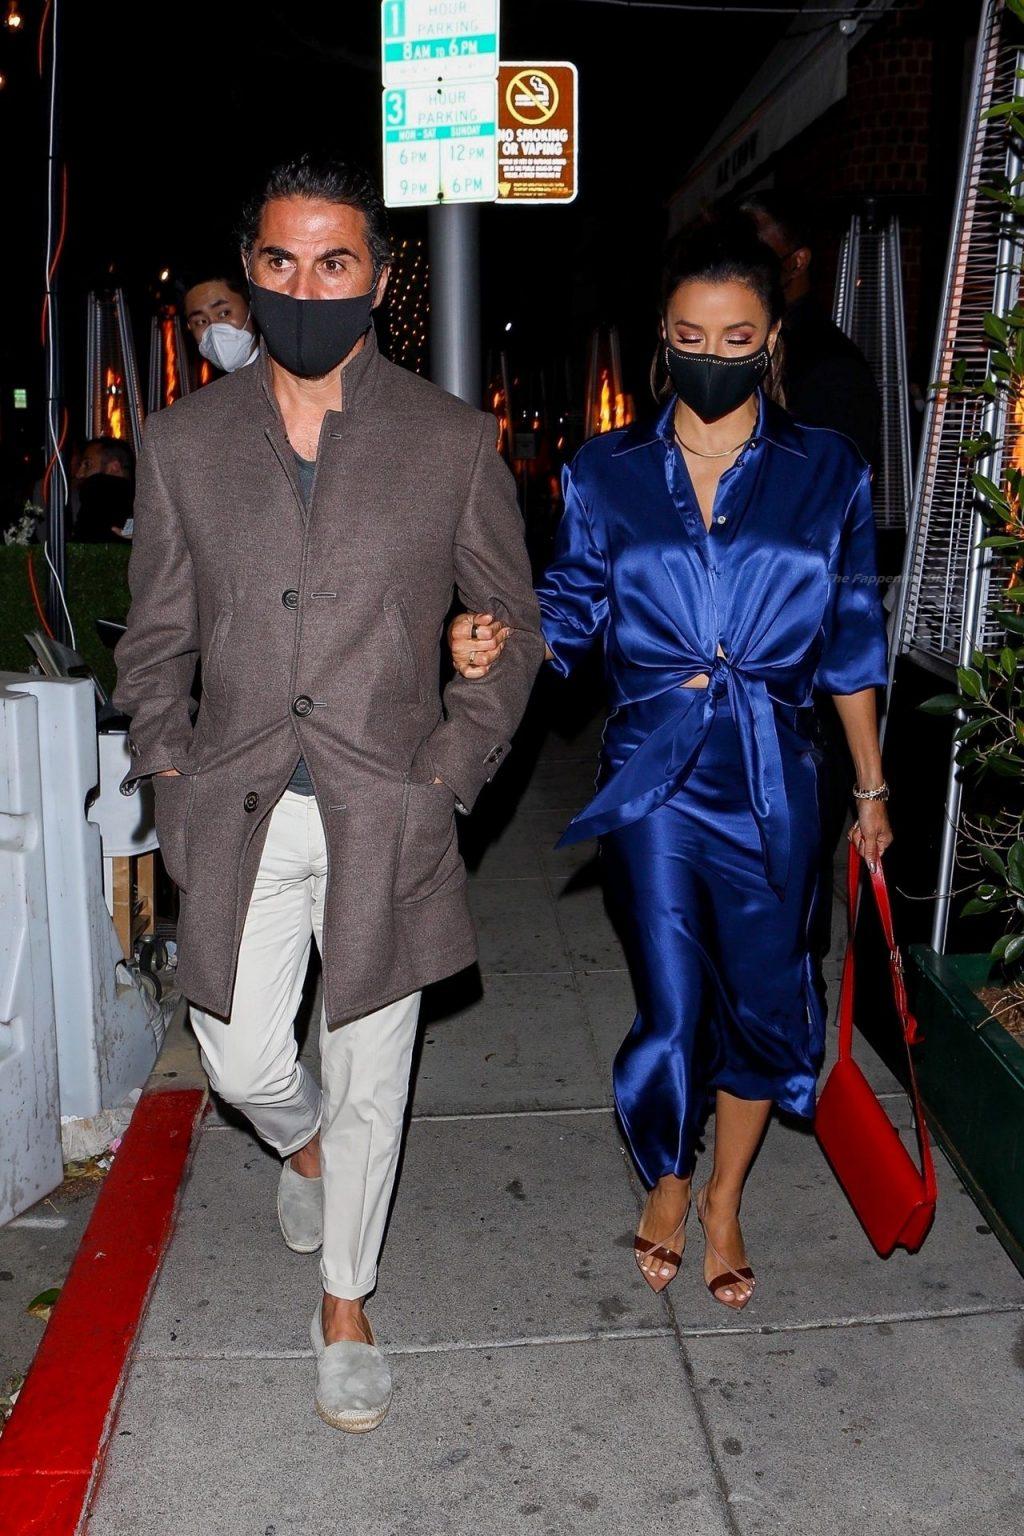 Eva Longoria & Jose Baston Have Dinner at Mr. Chow (15 Photos)